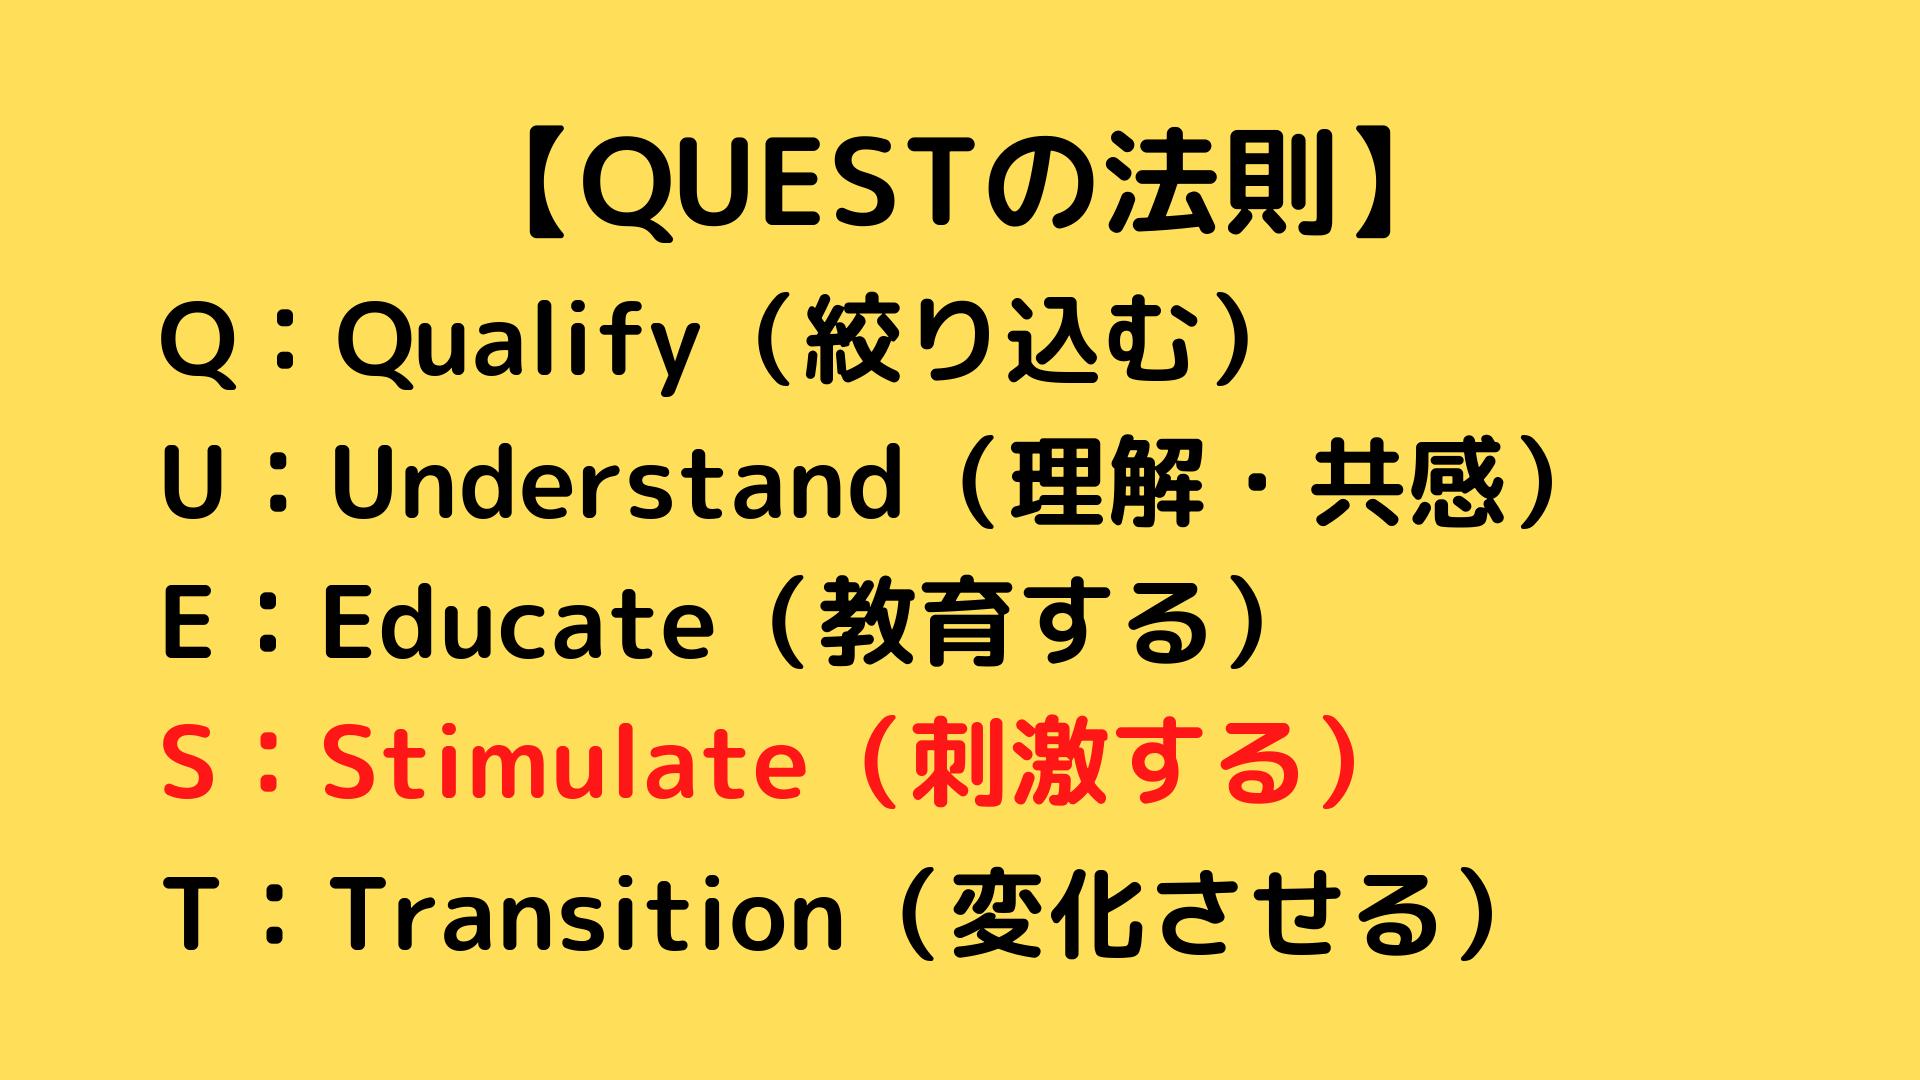 QUESTの法則 QUESTフォーミュラ 5